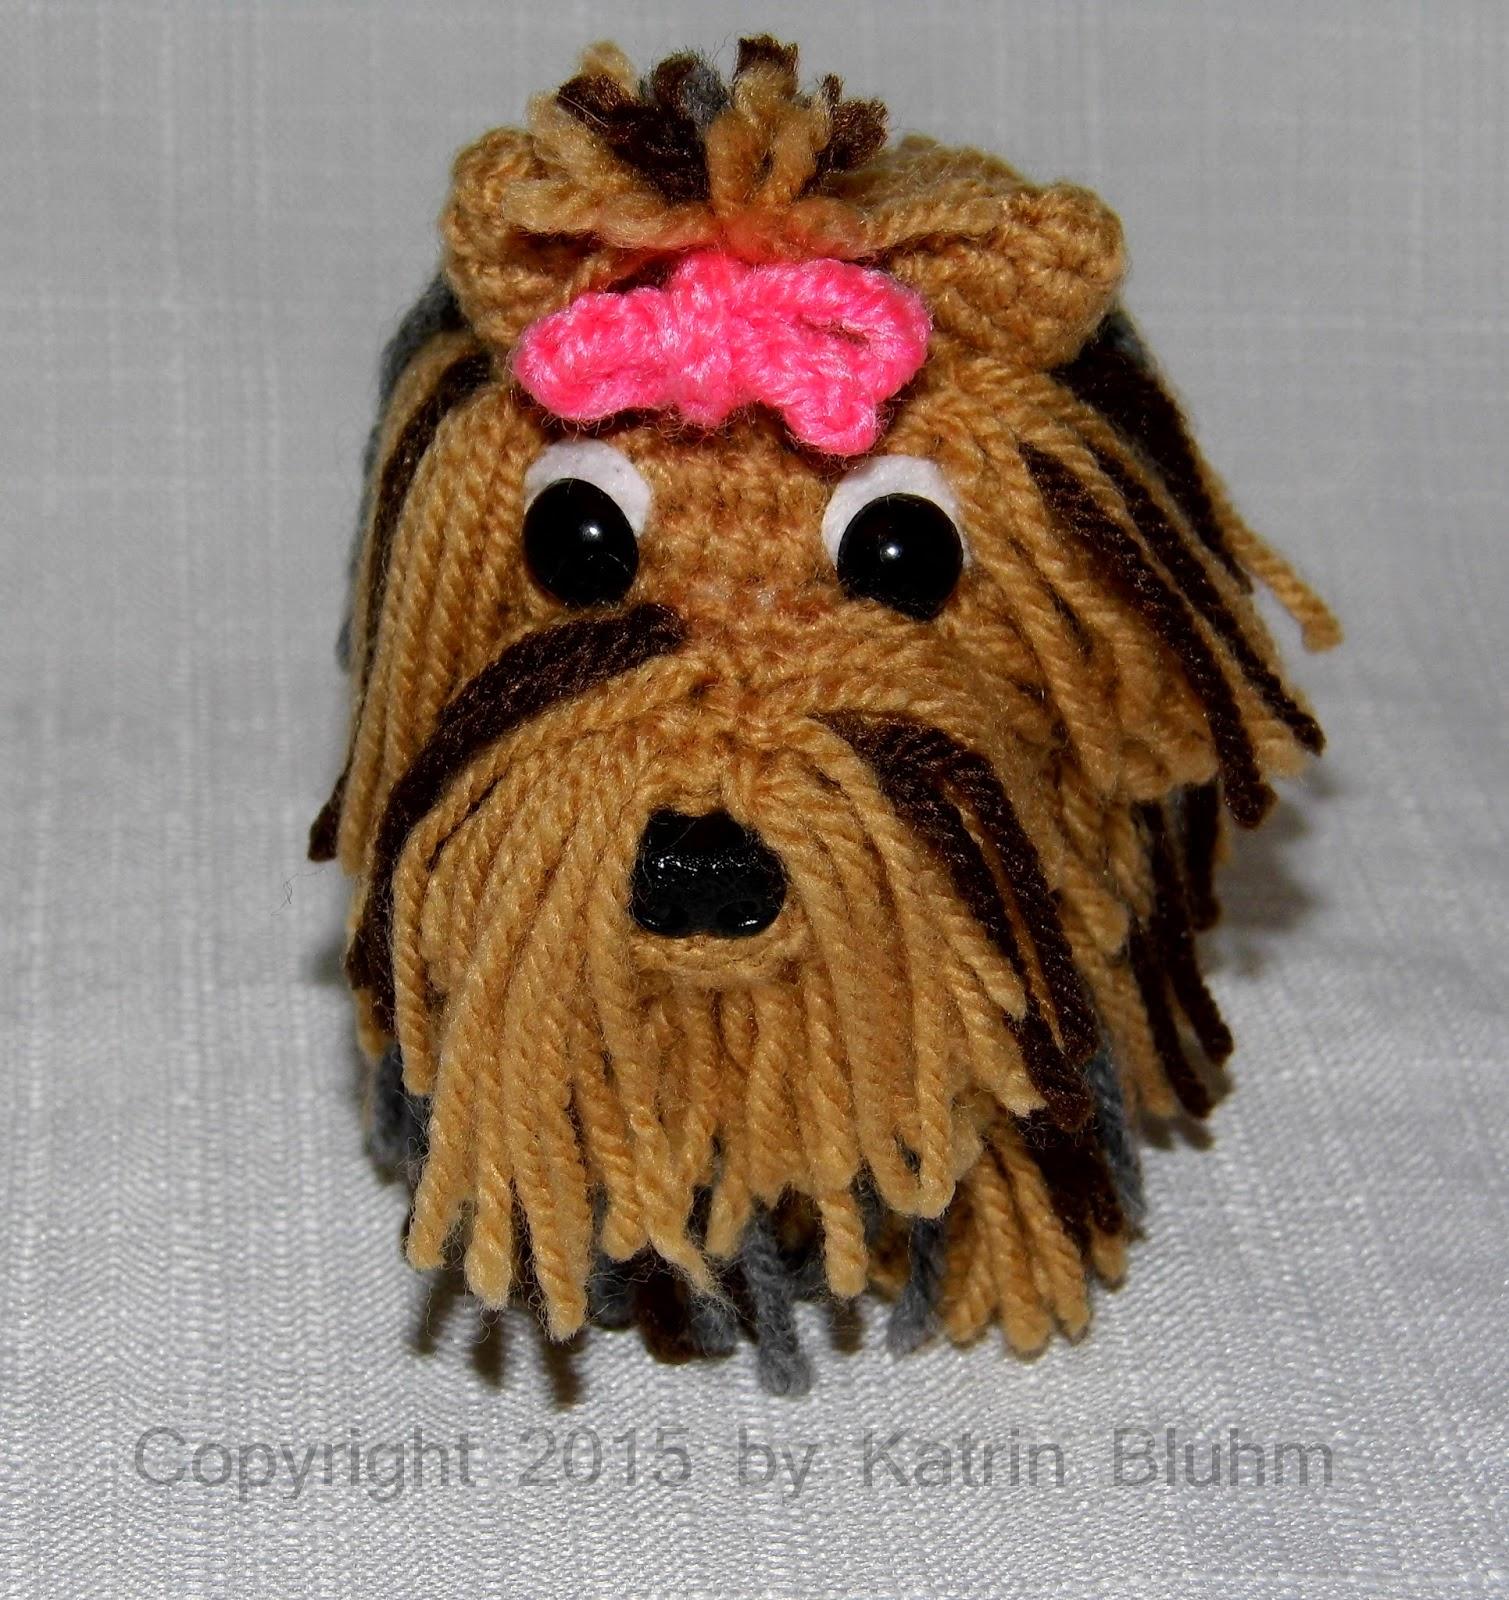 Yorkshire Terrier Amigurumi Animal Crochet Stuffed Kid Plush Toy ... | 1600x1509